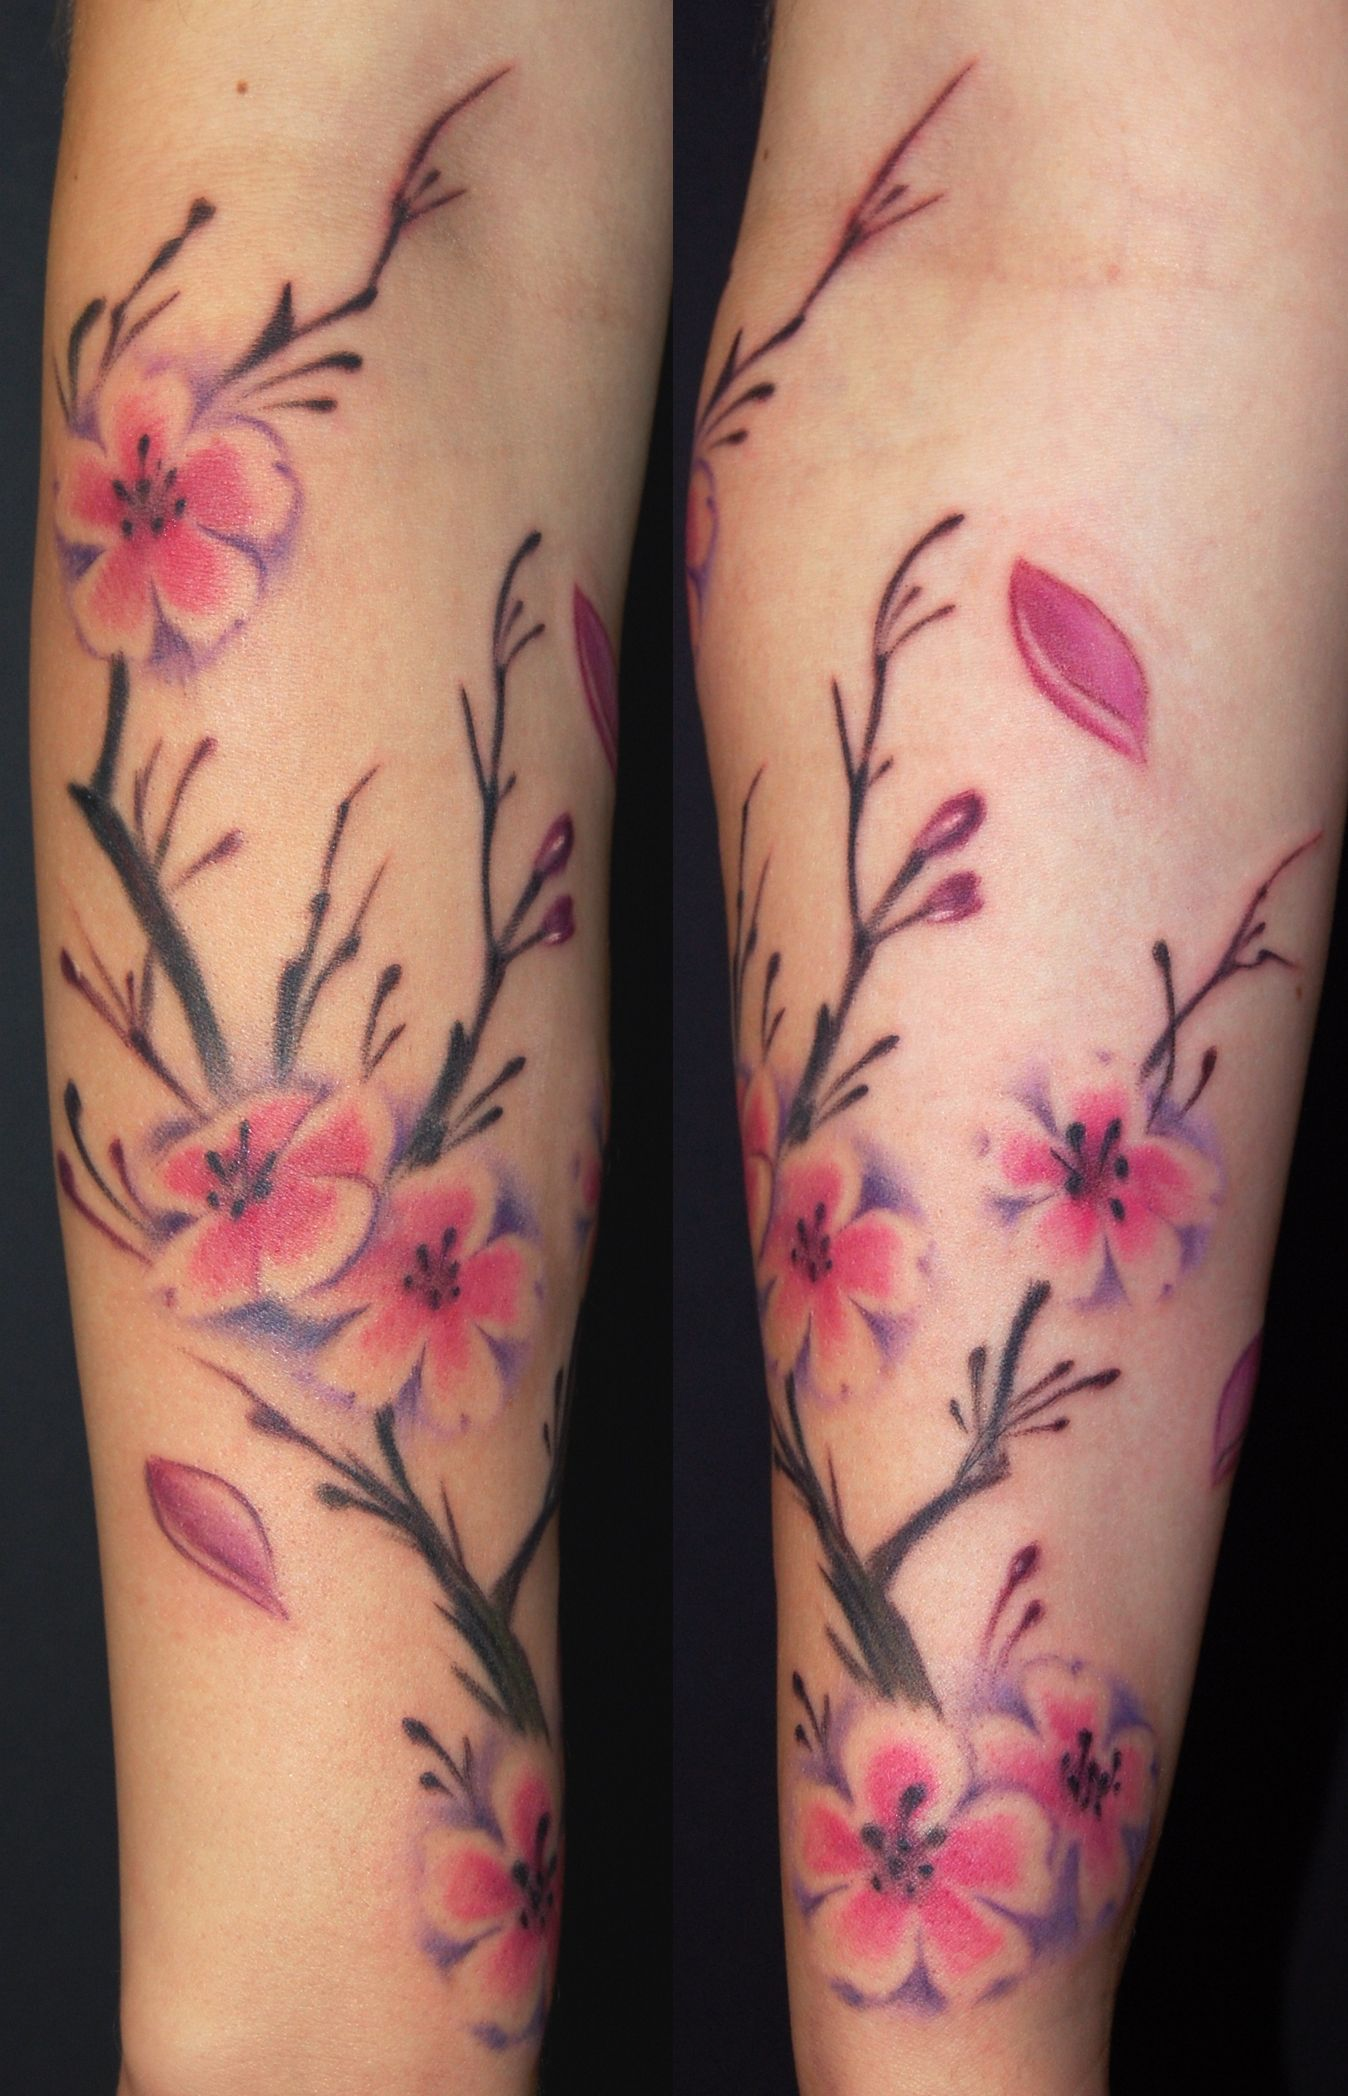 Pin By Emyg3 On Tattoos Blossom Tree Tattoo Cherry Blossom Tattoo Meaning Cherry Blossom Tattoo